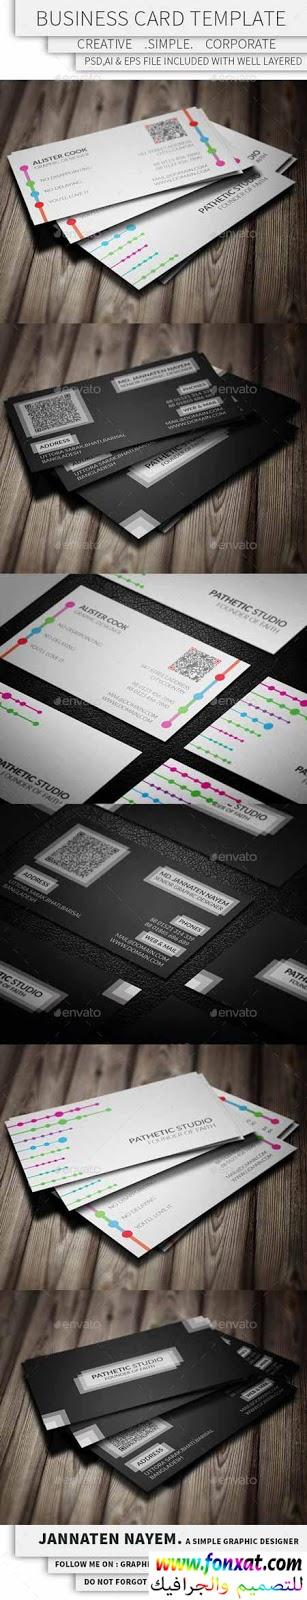 business card تصميم كارت شخصى احترافى psd رقم 17